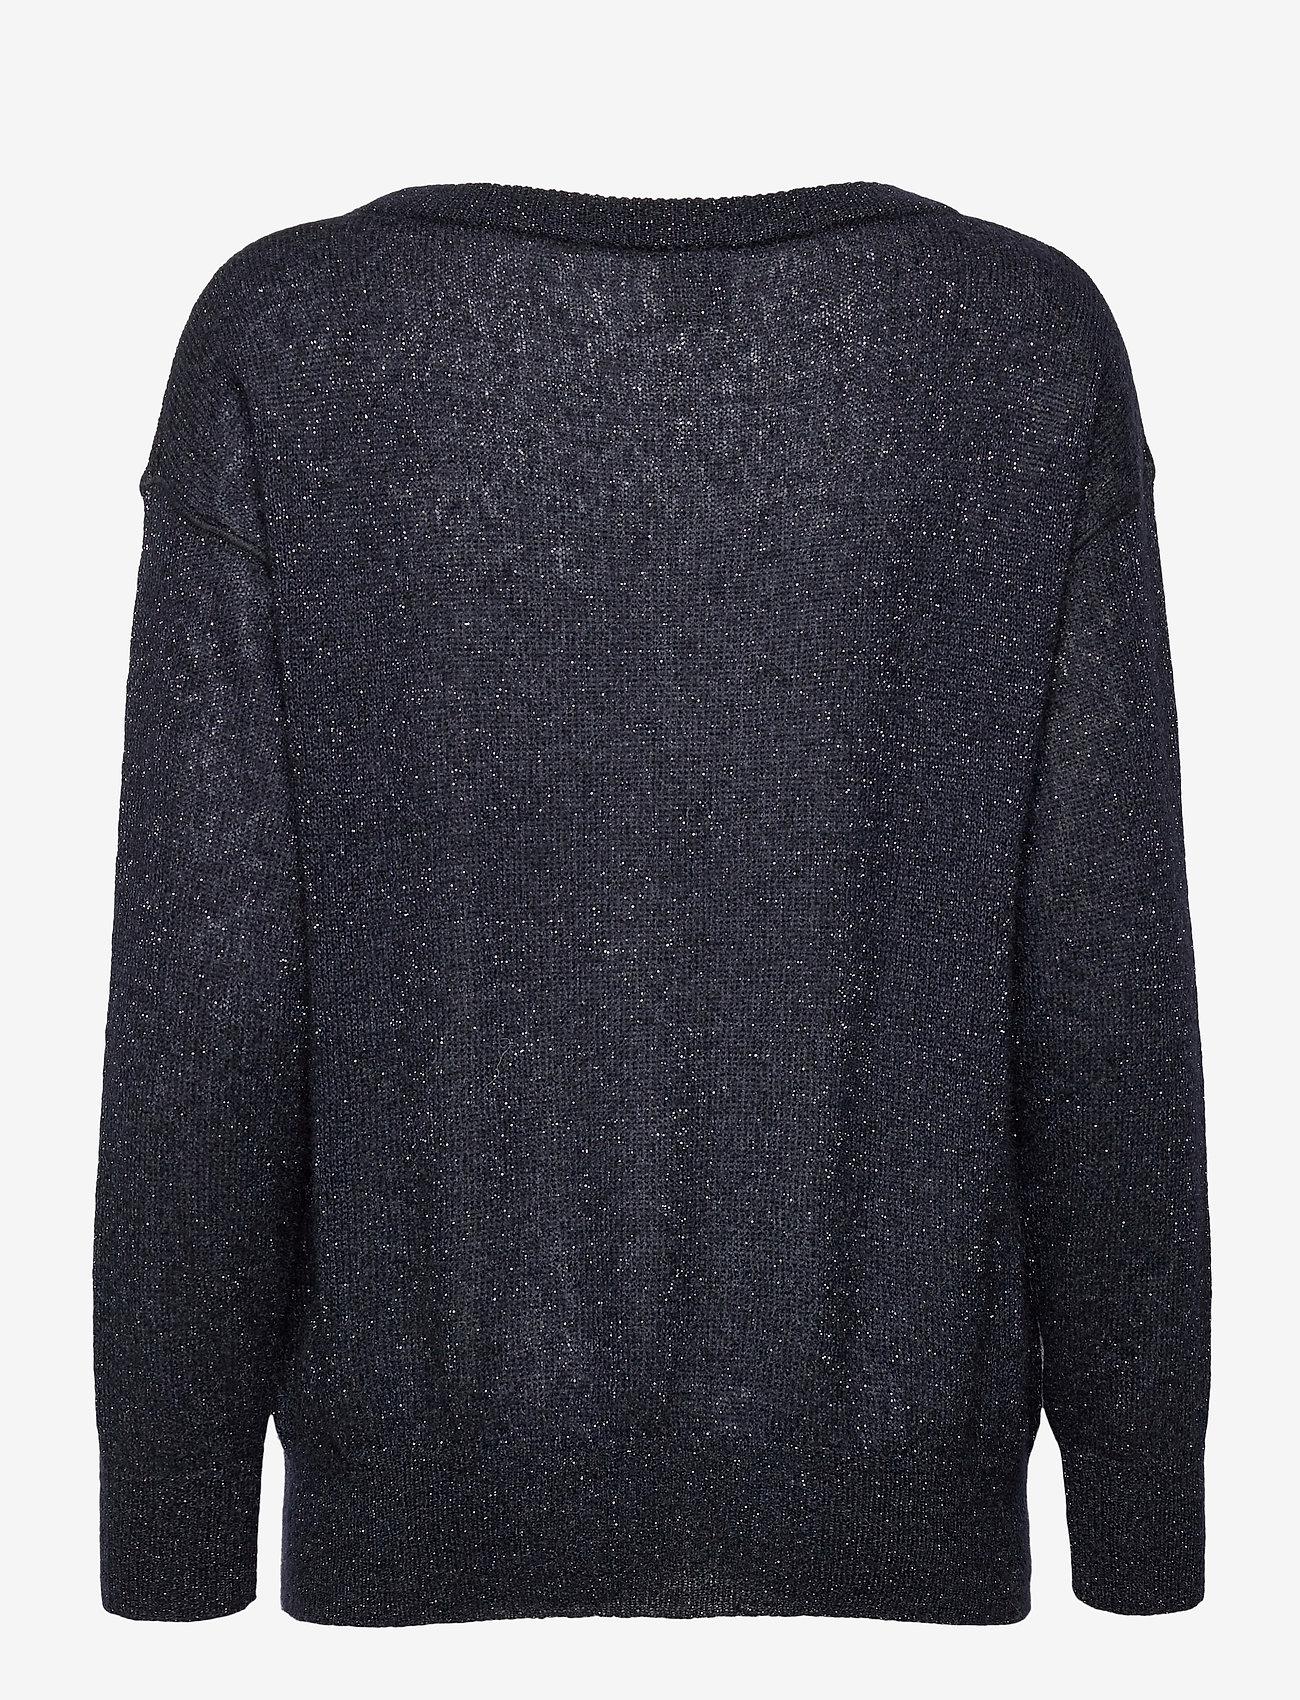 Max Mara Leisure - PILADE - sweaters - navy - 1